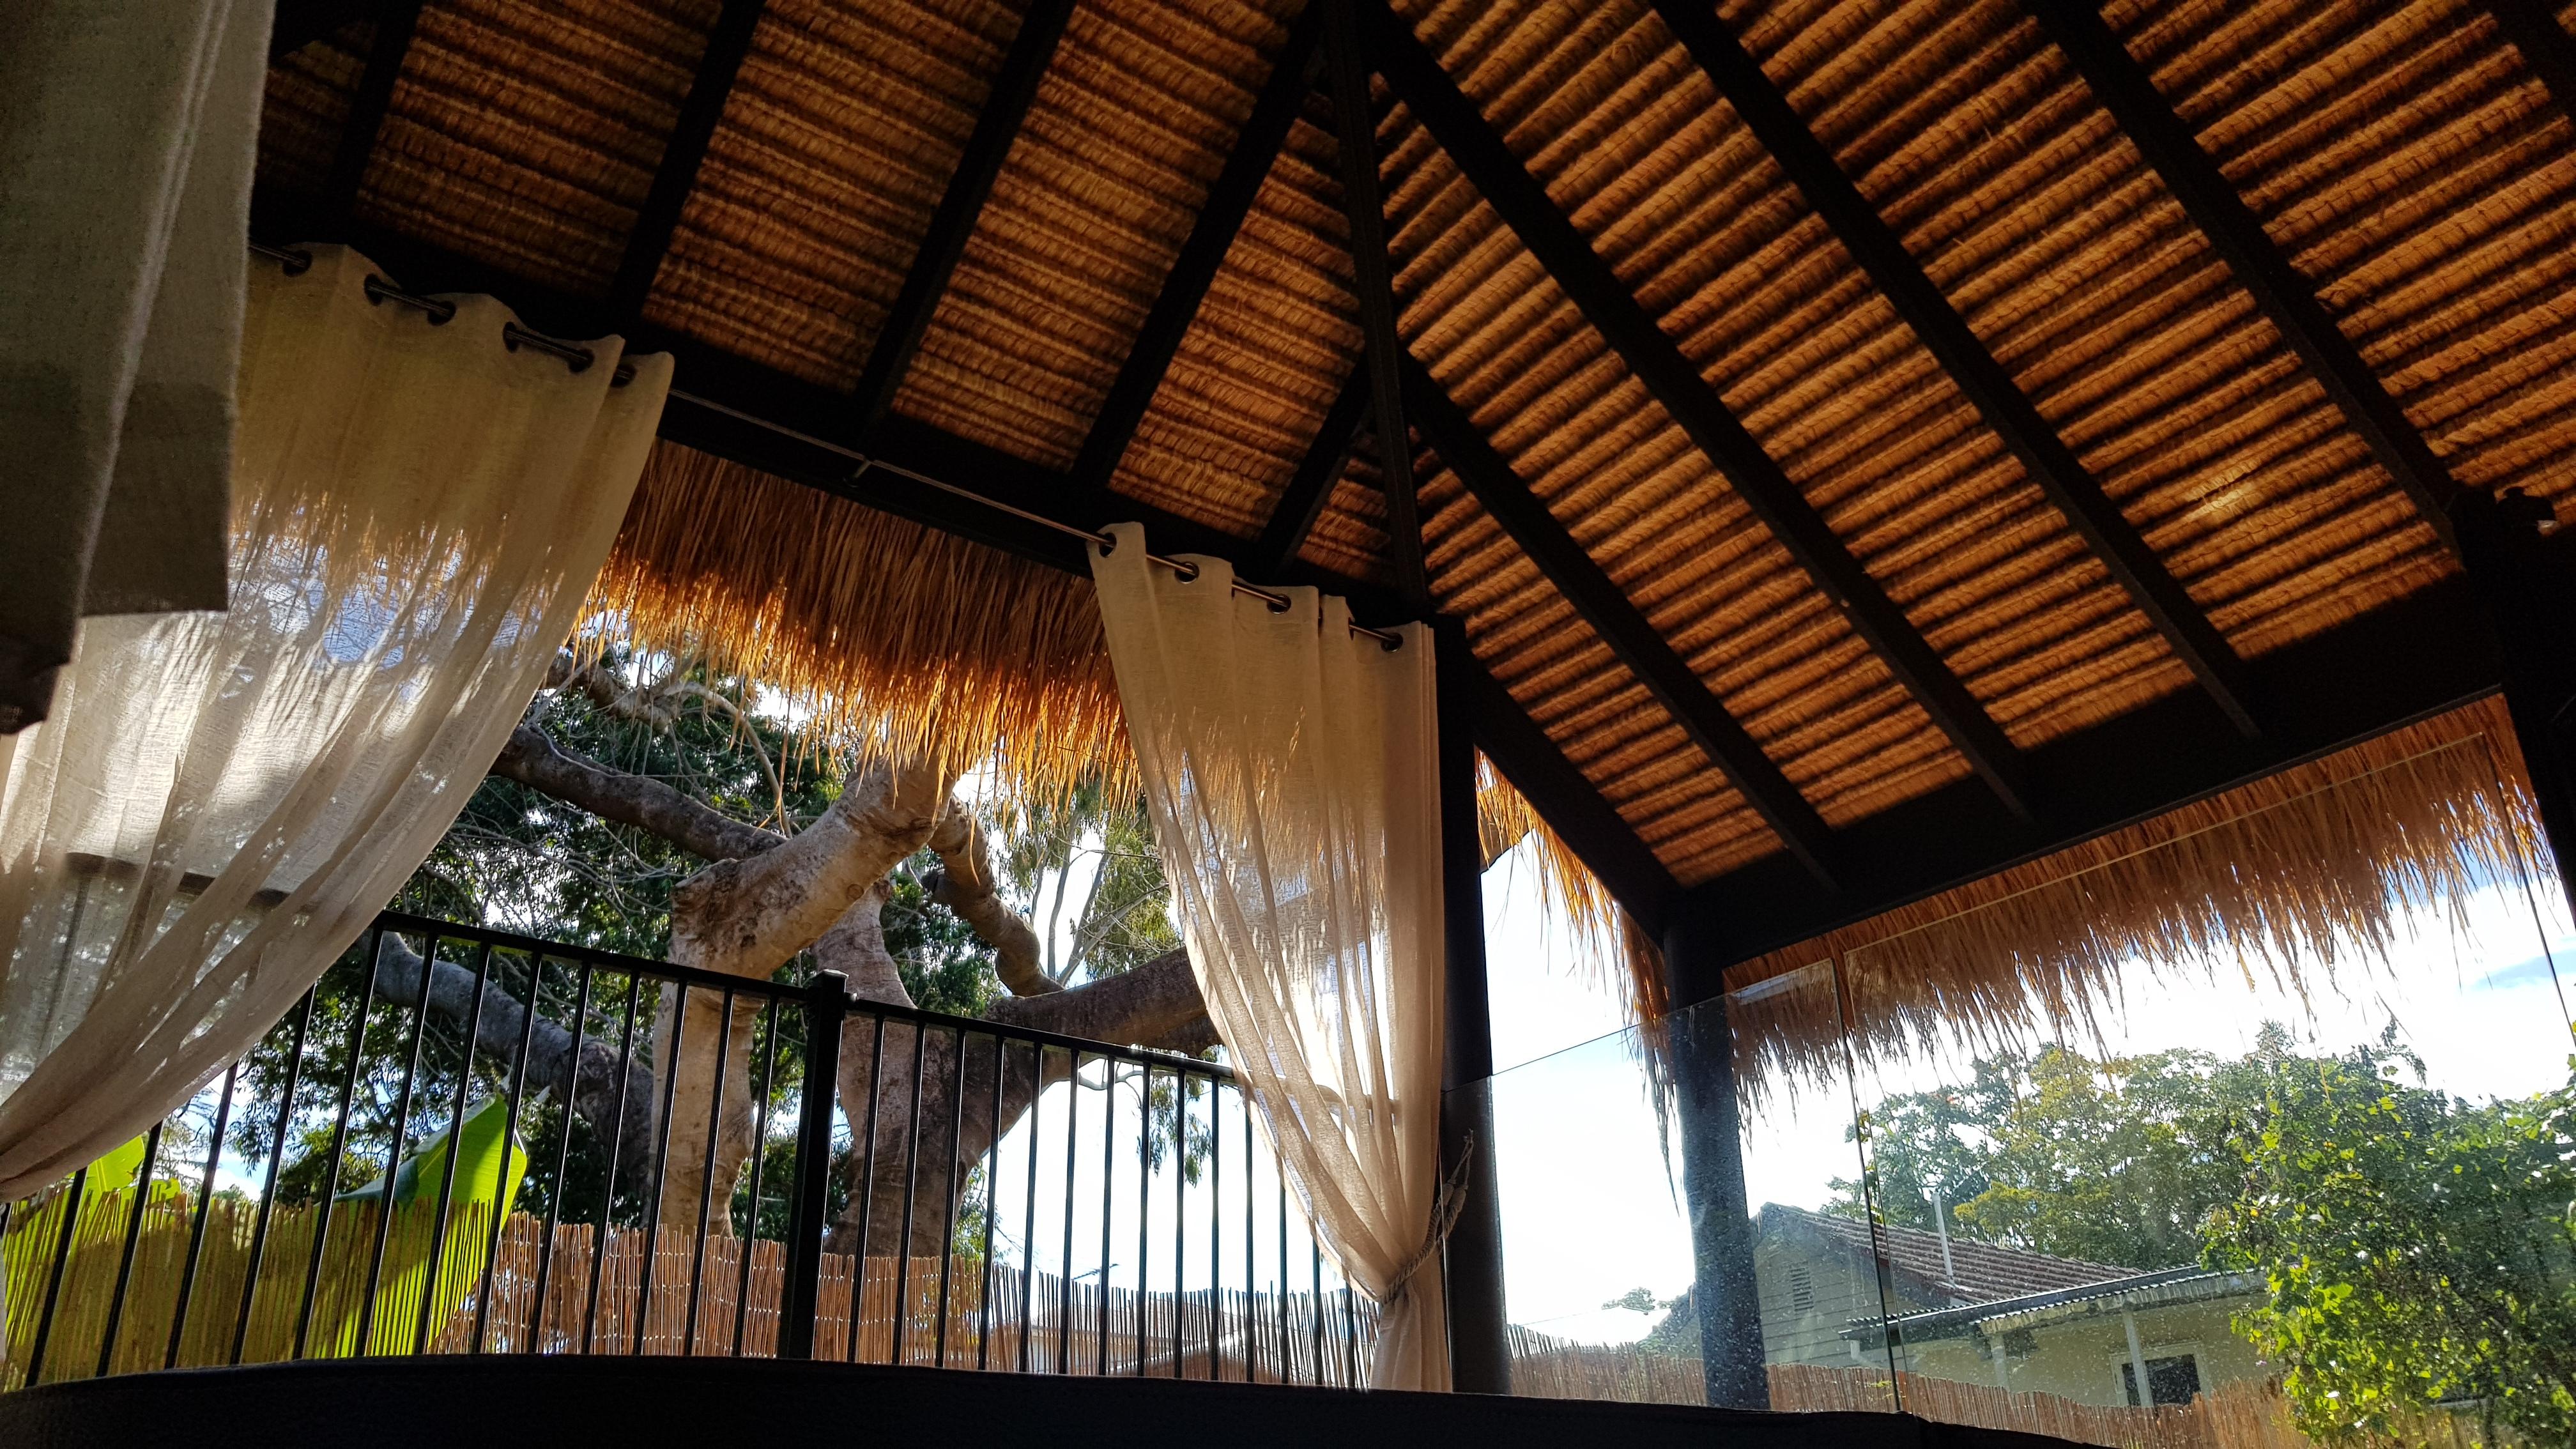 Brisbane Thahcth Bali Huts